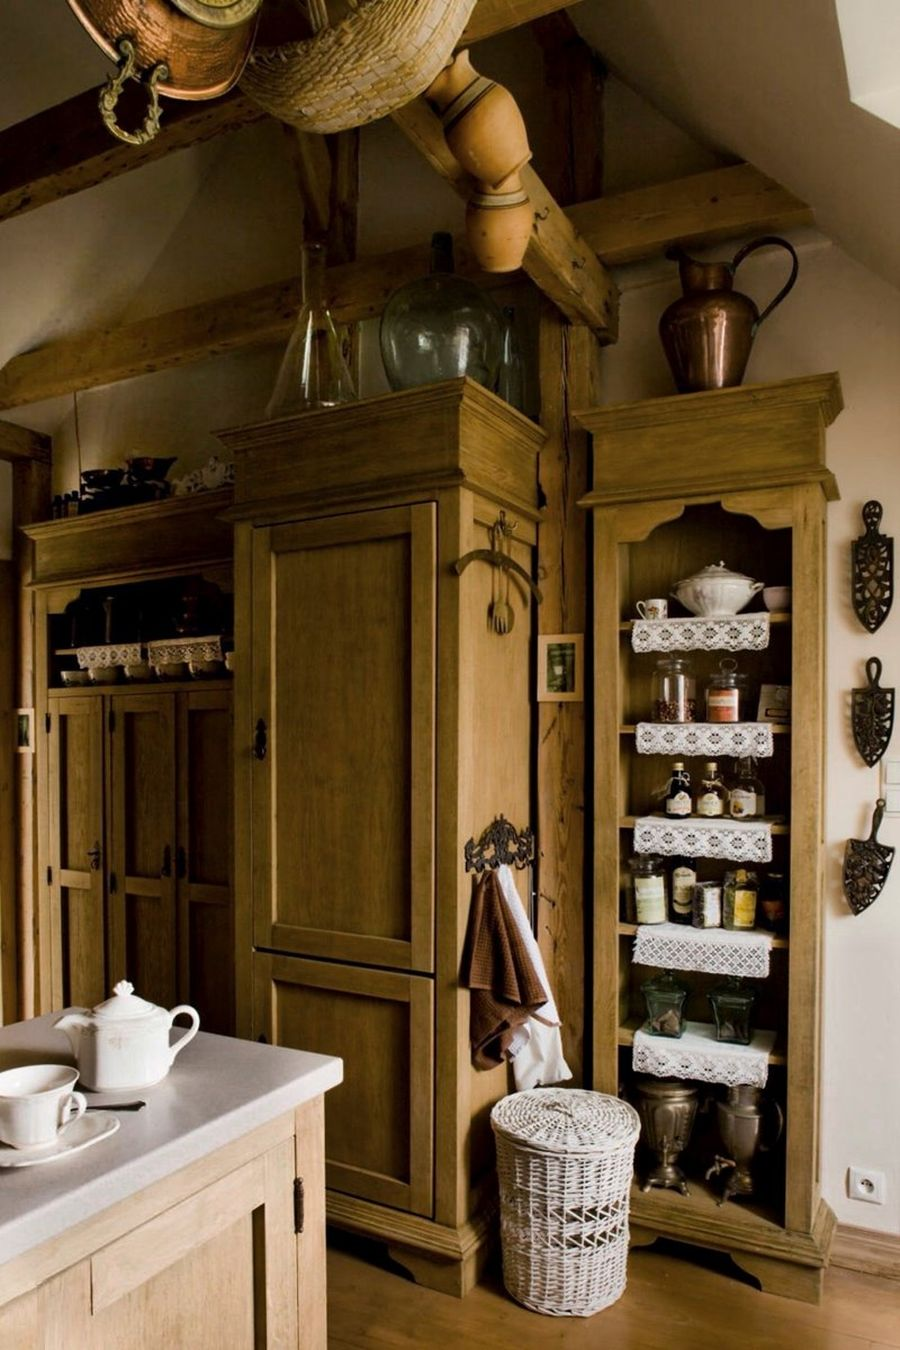 adelaparvu.com despre mansarda romantica, stil rustic, Design PrzepisnaDom, Foto Rafal Lipski (5)